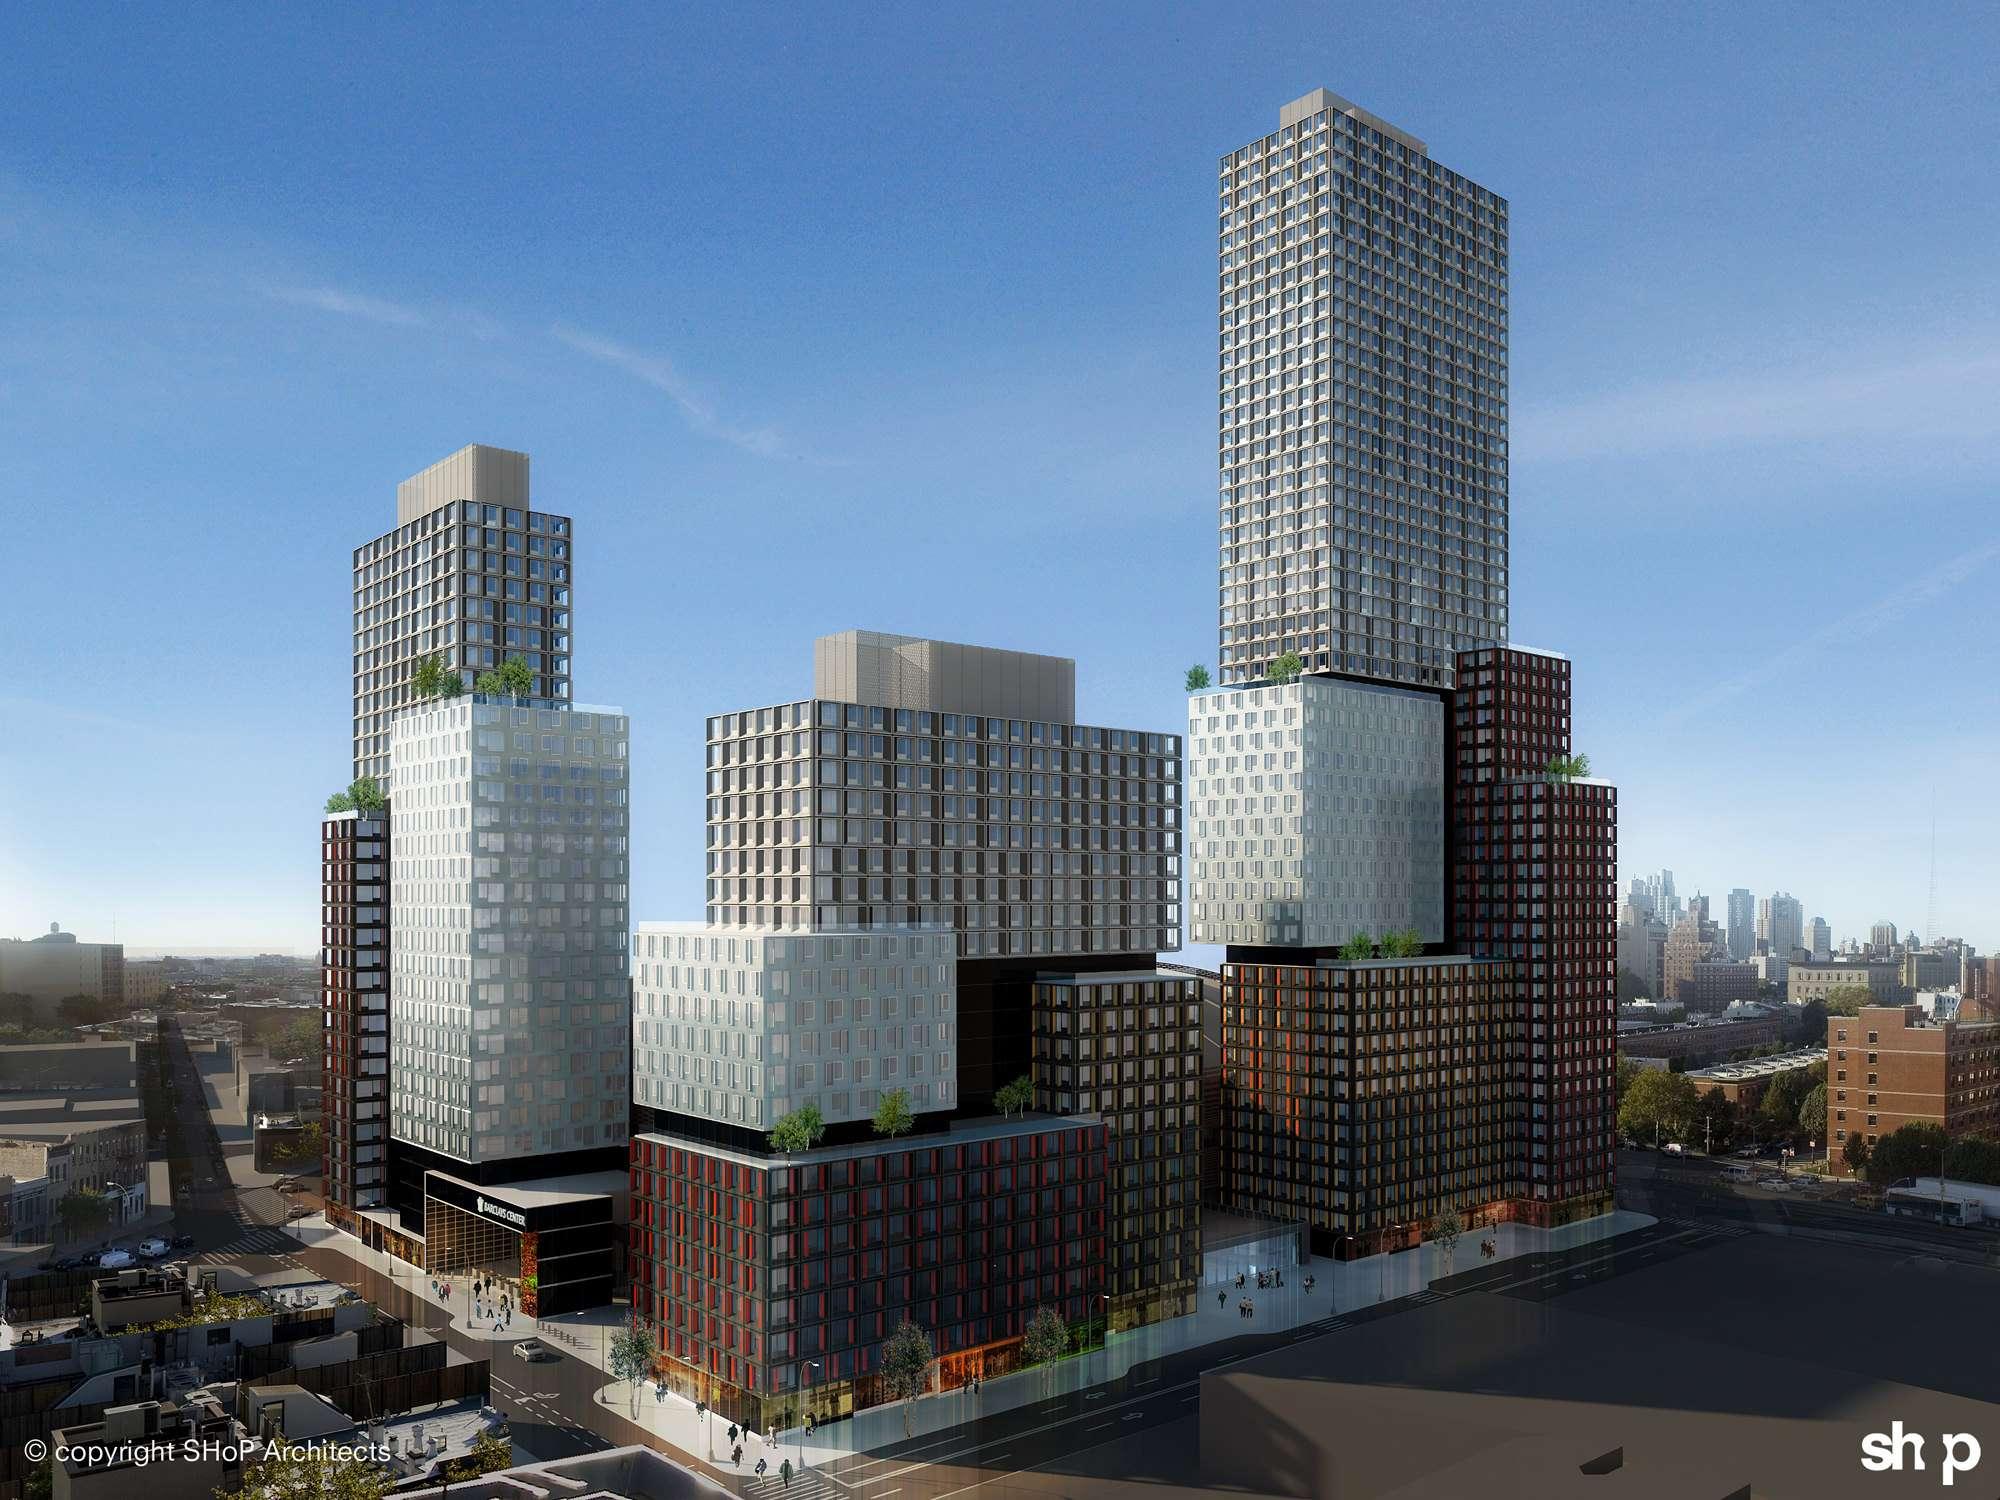 Brooklyn's Atlantic Yards, an oasis of crony capitalism. |||